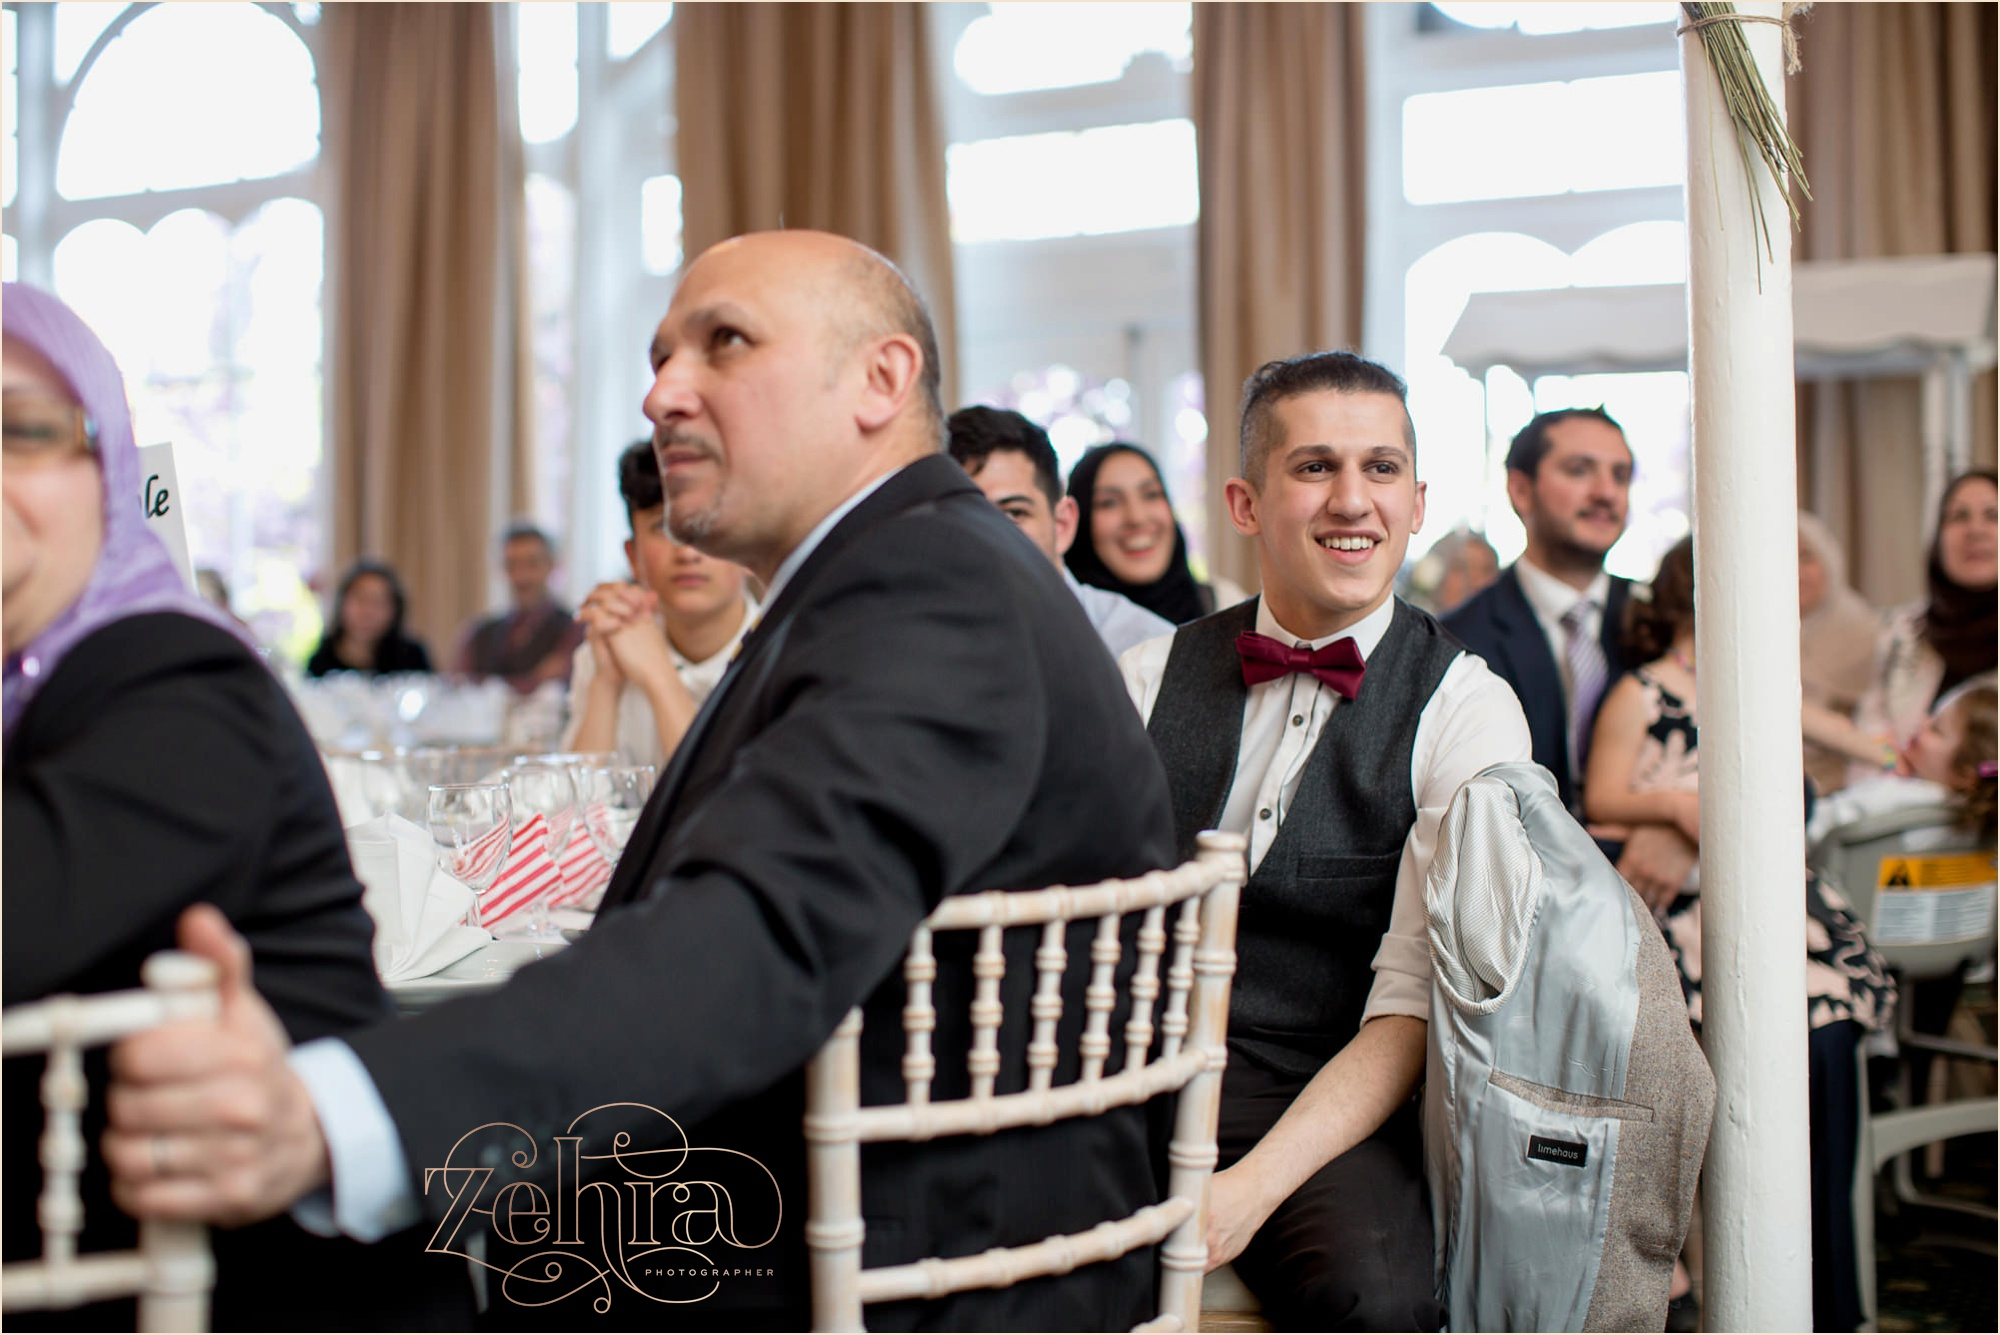 jasira manchester wedding photographer_0100.jpg